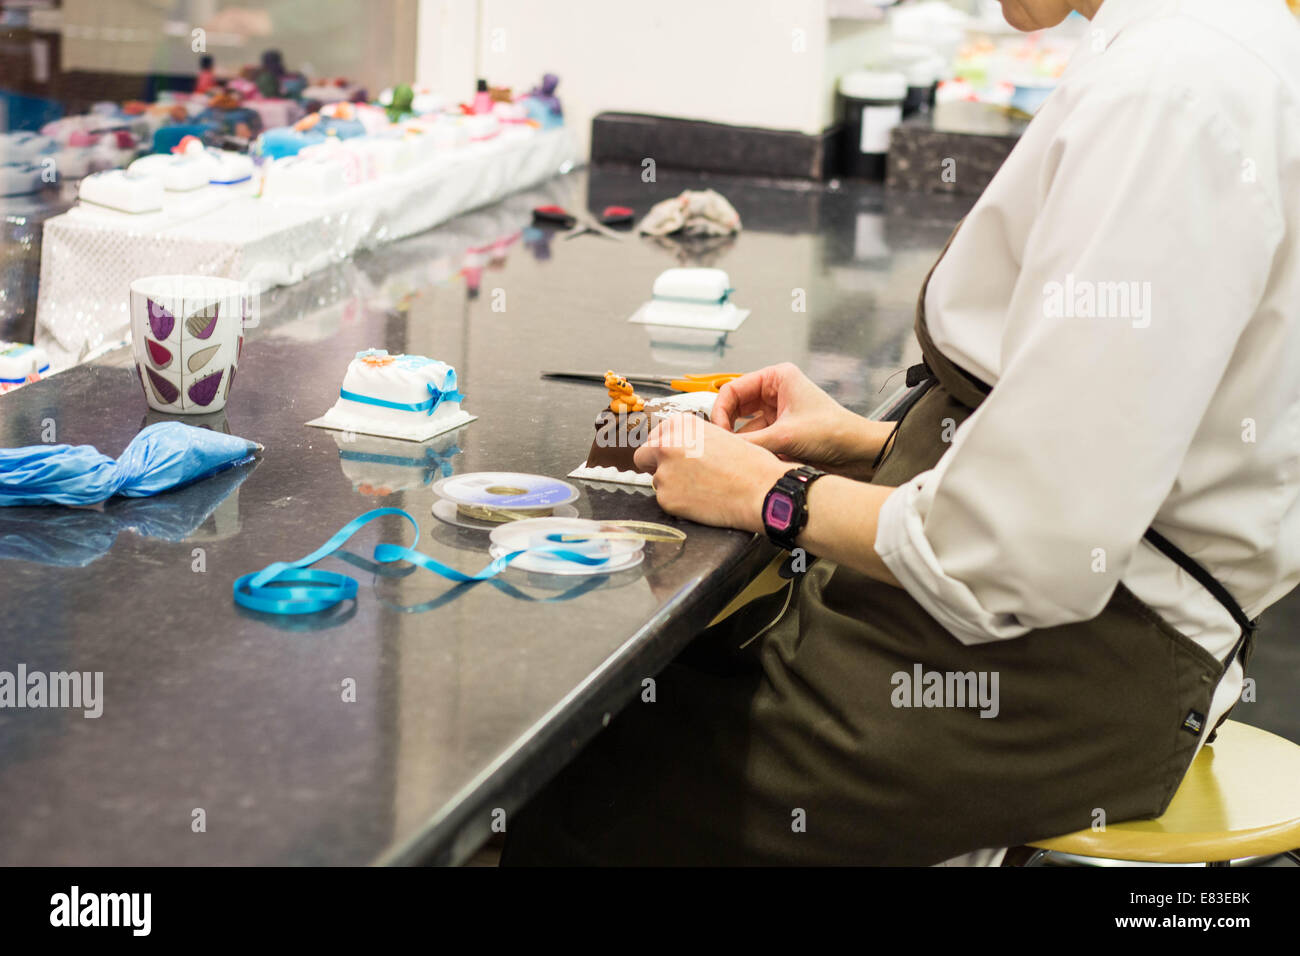 Woman decorating cakes. - Stock Image